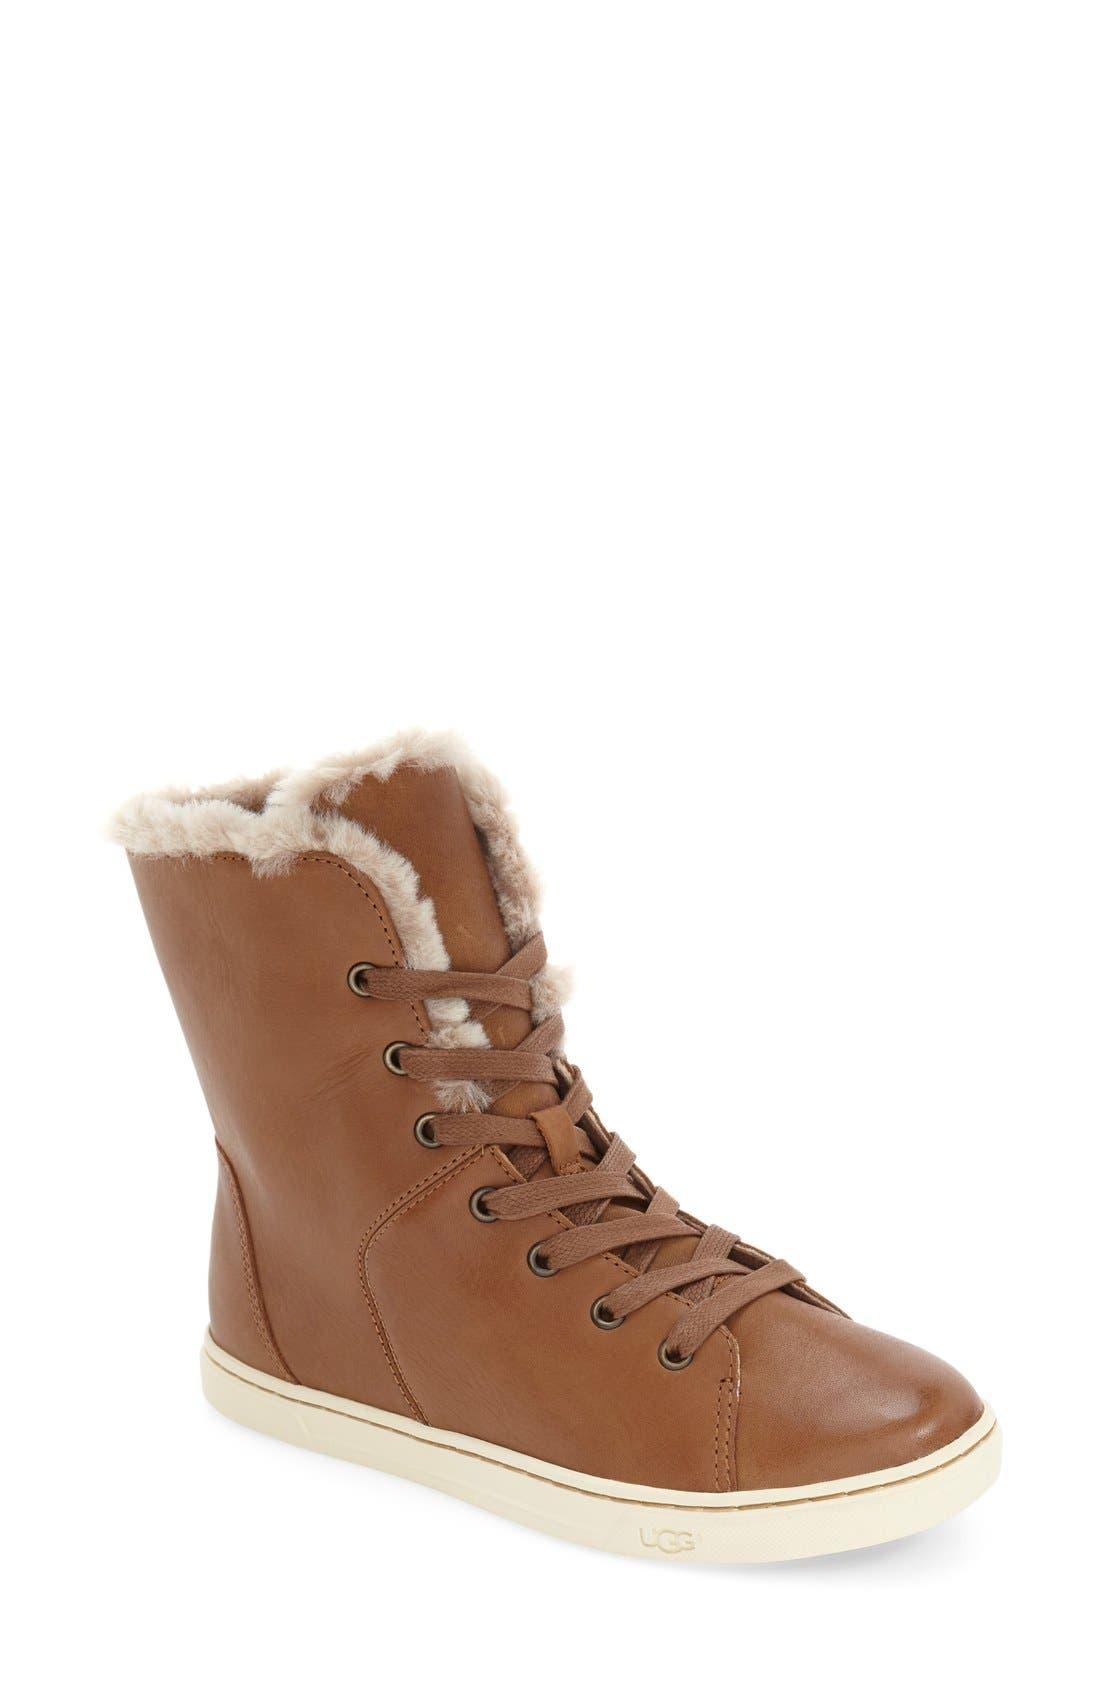 Alternate Image 1 Selected - UGG® 'Croft Luxe' Genuine Shearling High Top Sneaker (Women)